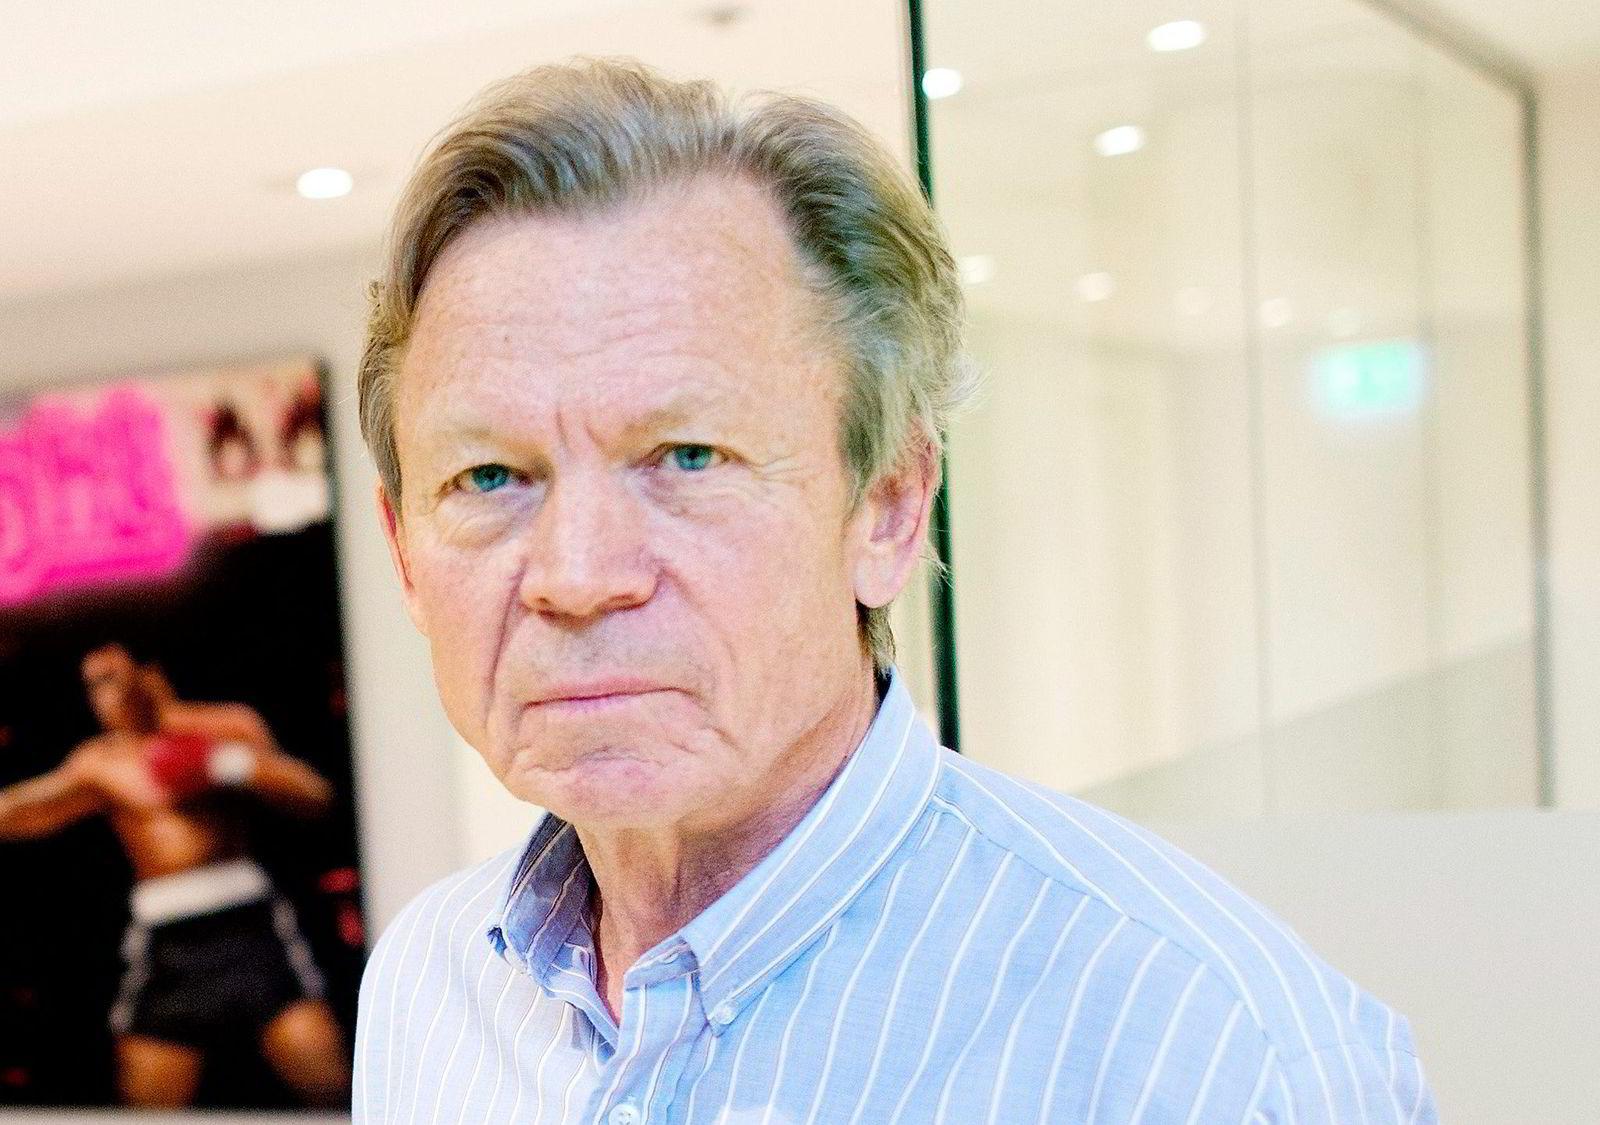 ... tidligere Yara-sjef Thorleif Enger (72) ...  Foto: